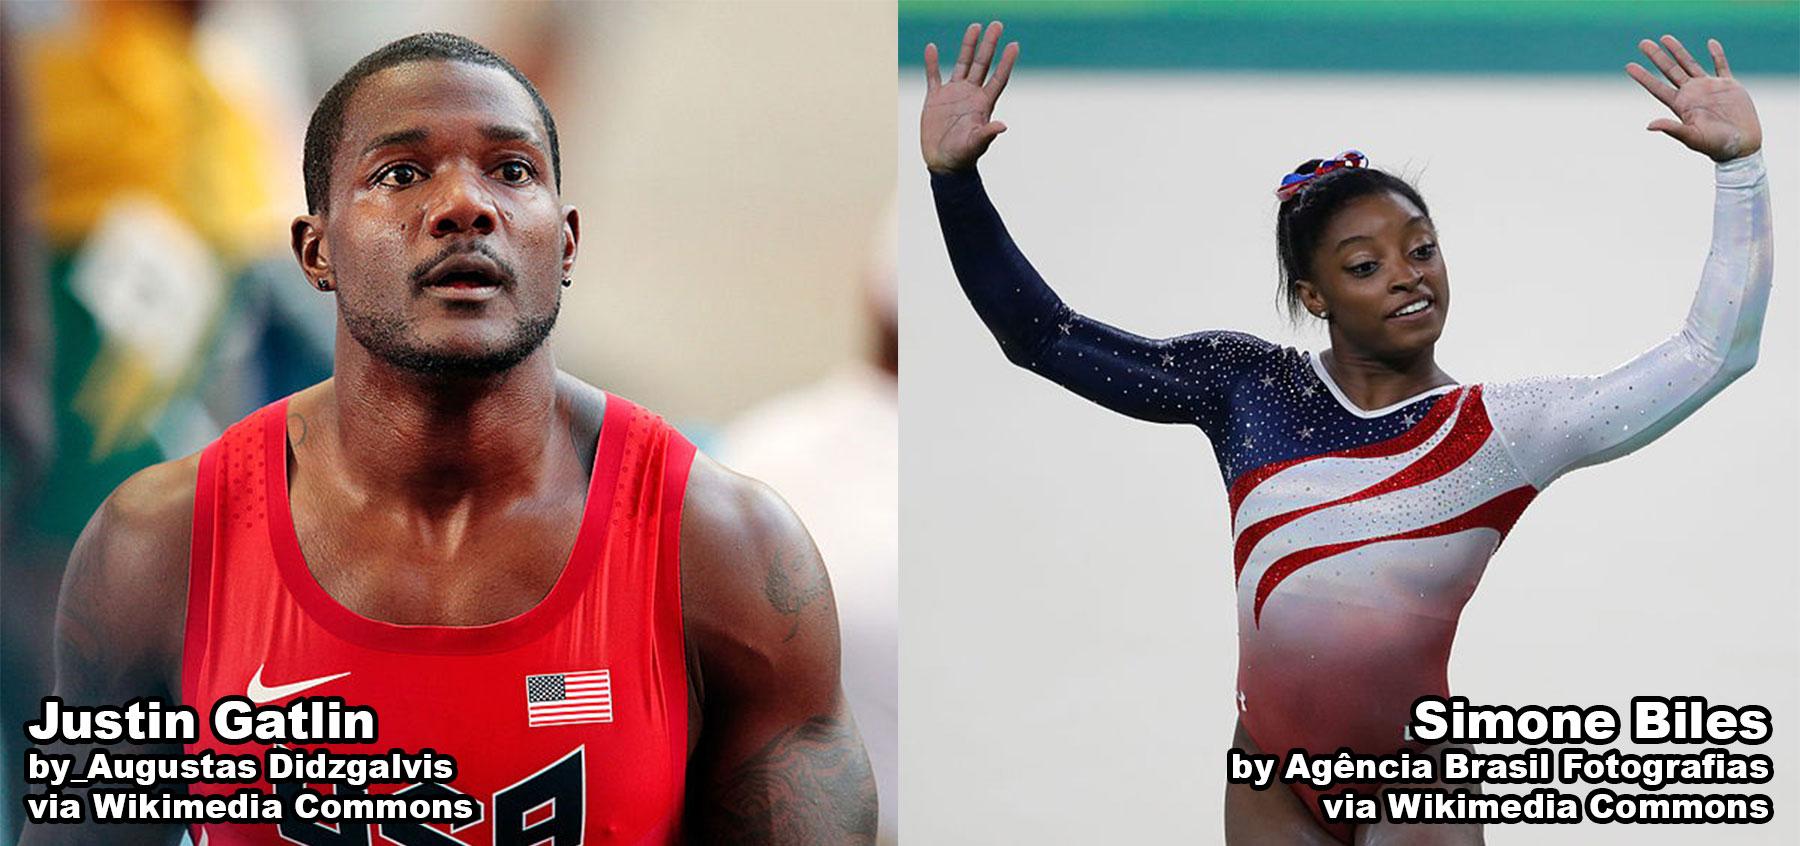 Sprinter Justin Gatlin and Gymnast Simone Biles